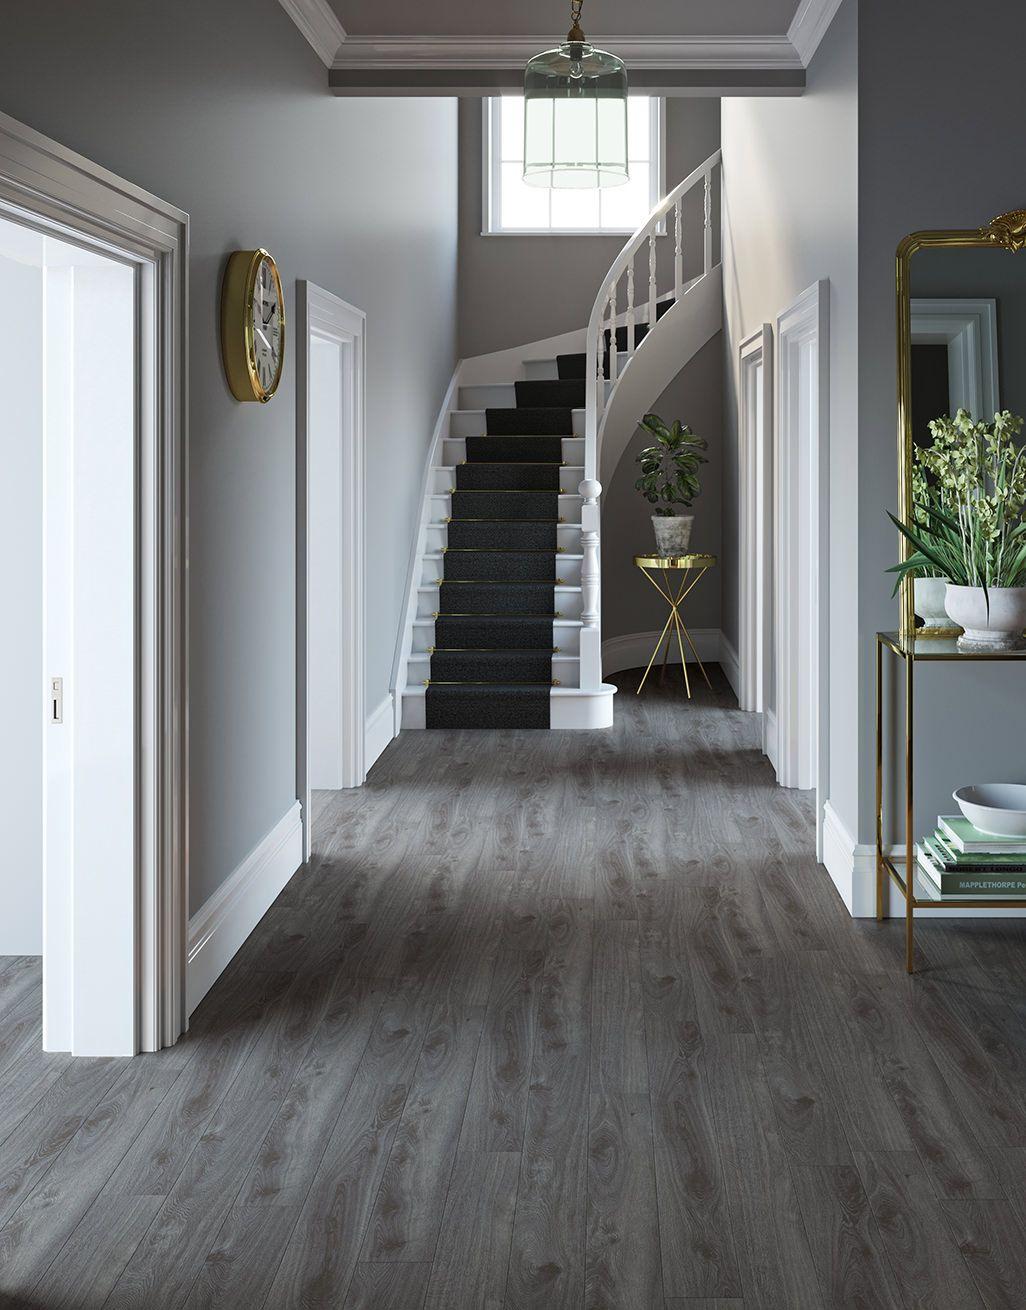 Prestige Grey Oak Laminate Flooring, Laminate Flooring Dark Grey